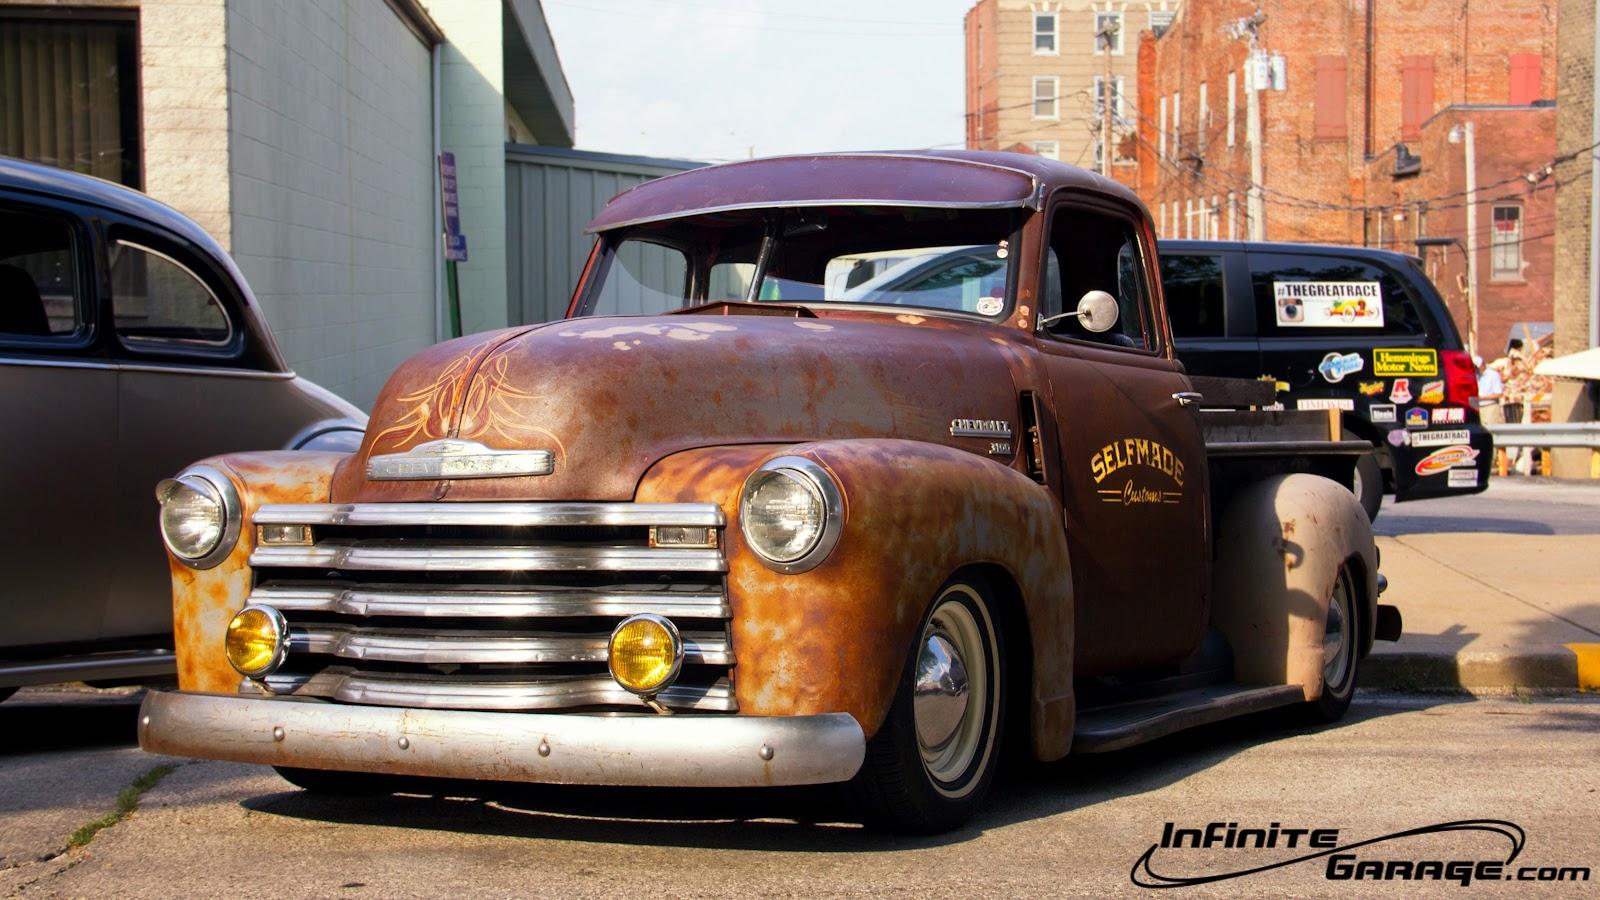 American Rat Rod Cars & Trucks For Sale: Rat Rod Chevy and GMC Trucks